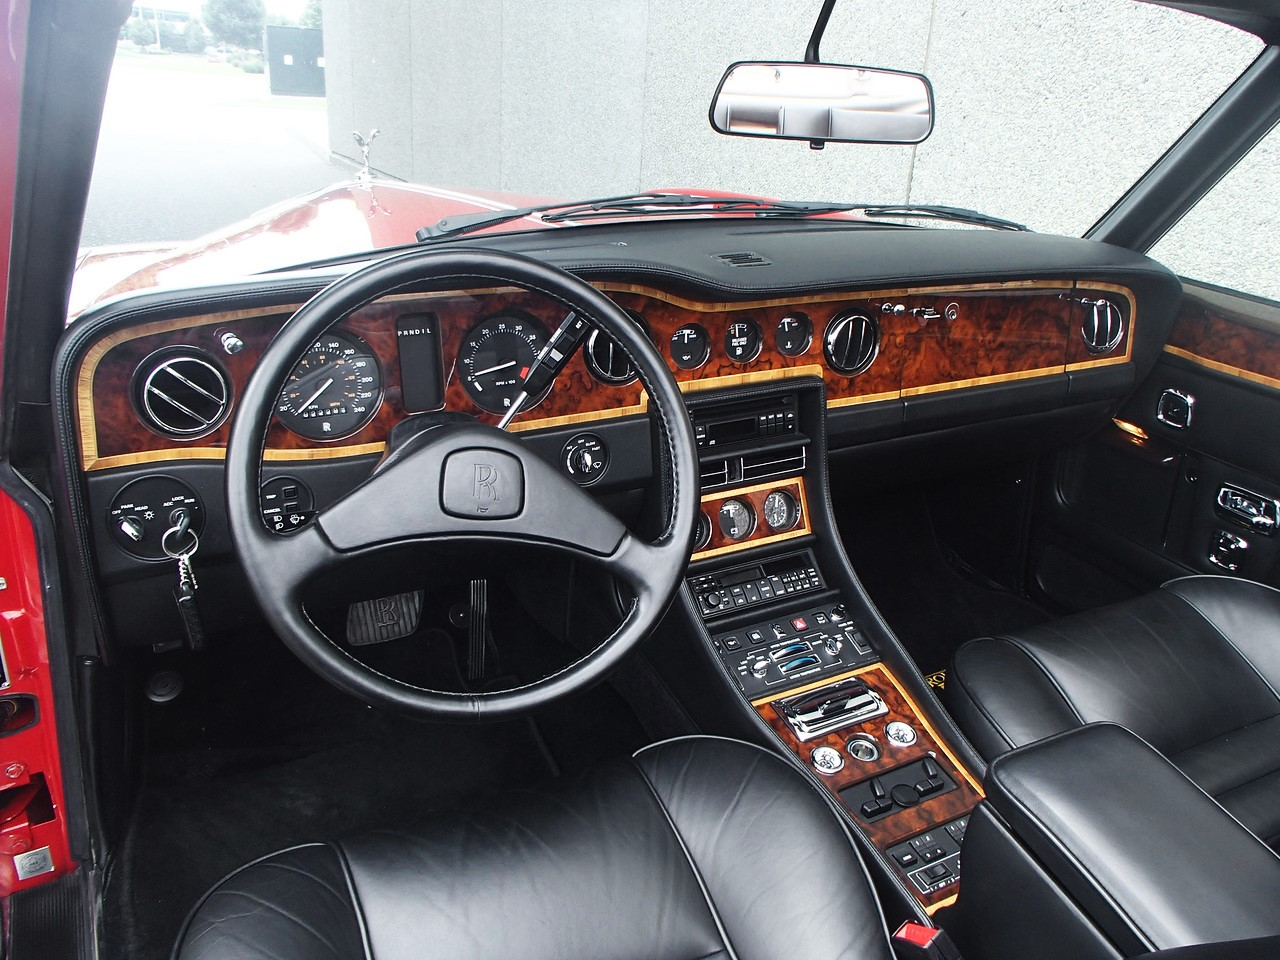 1991 Corniche Coachbuilt convertible 3